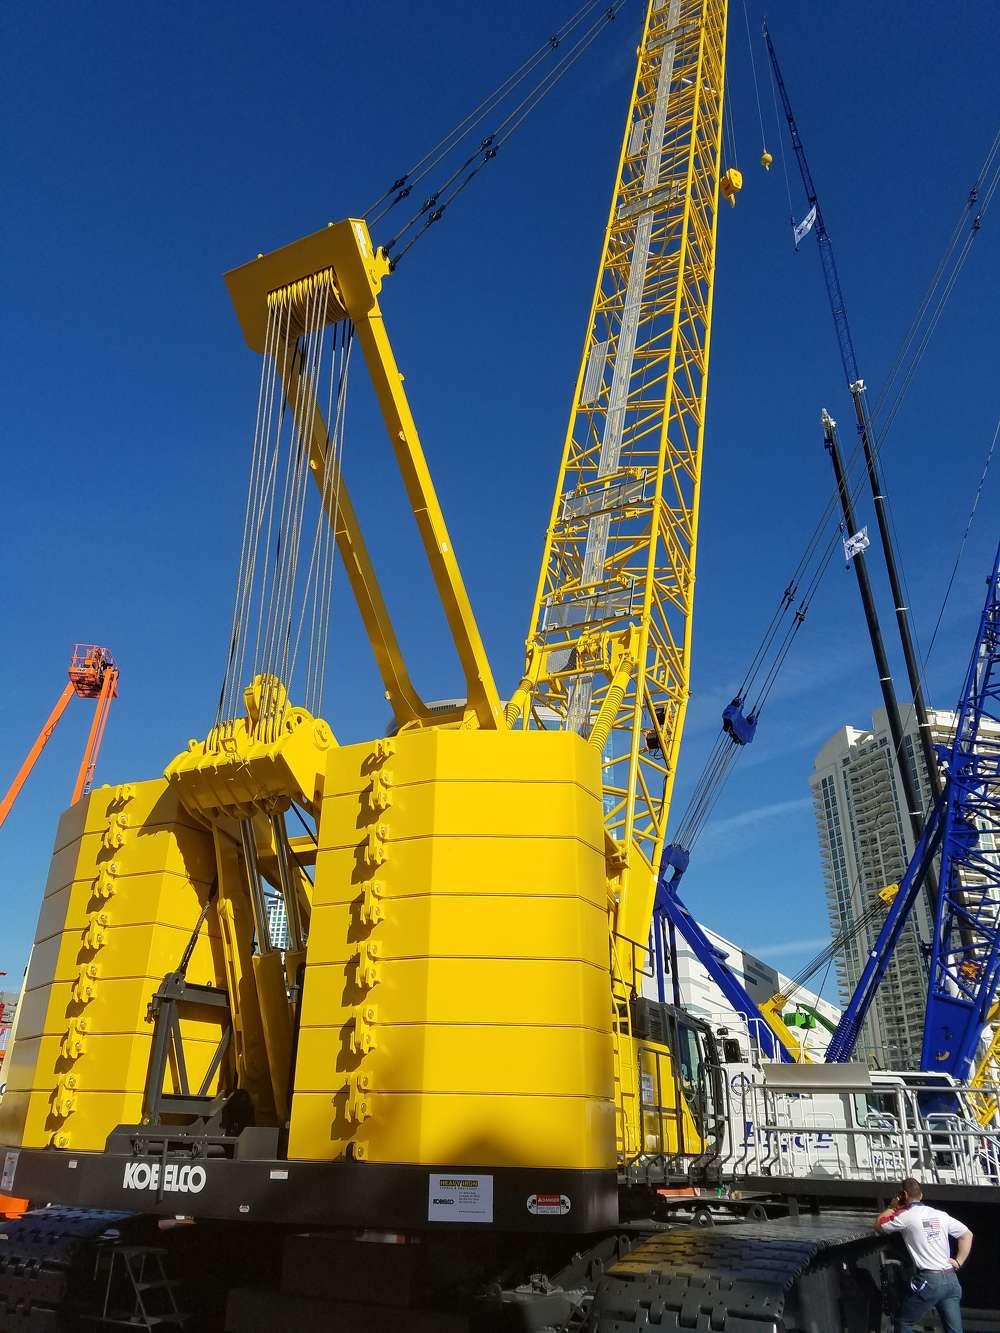 Kobelco had towering yellow cranes at its outdoor exhibit.